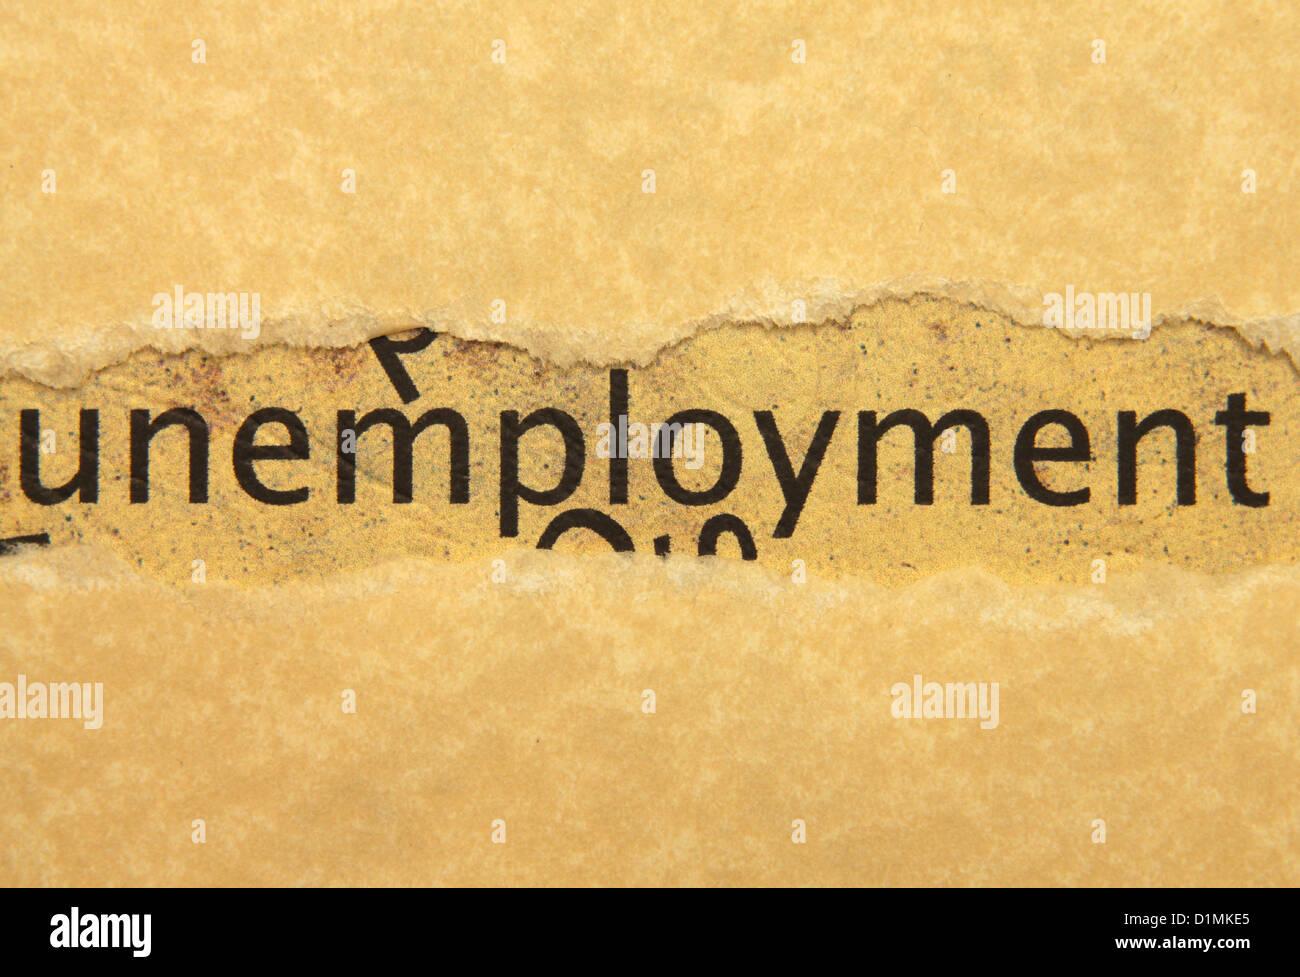 Unemployment text on grunge paper Stock Photo